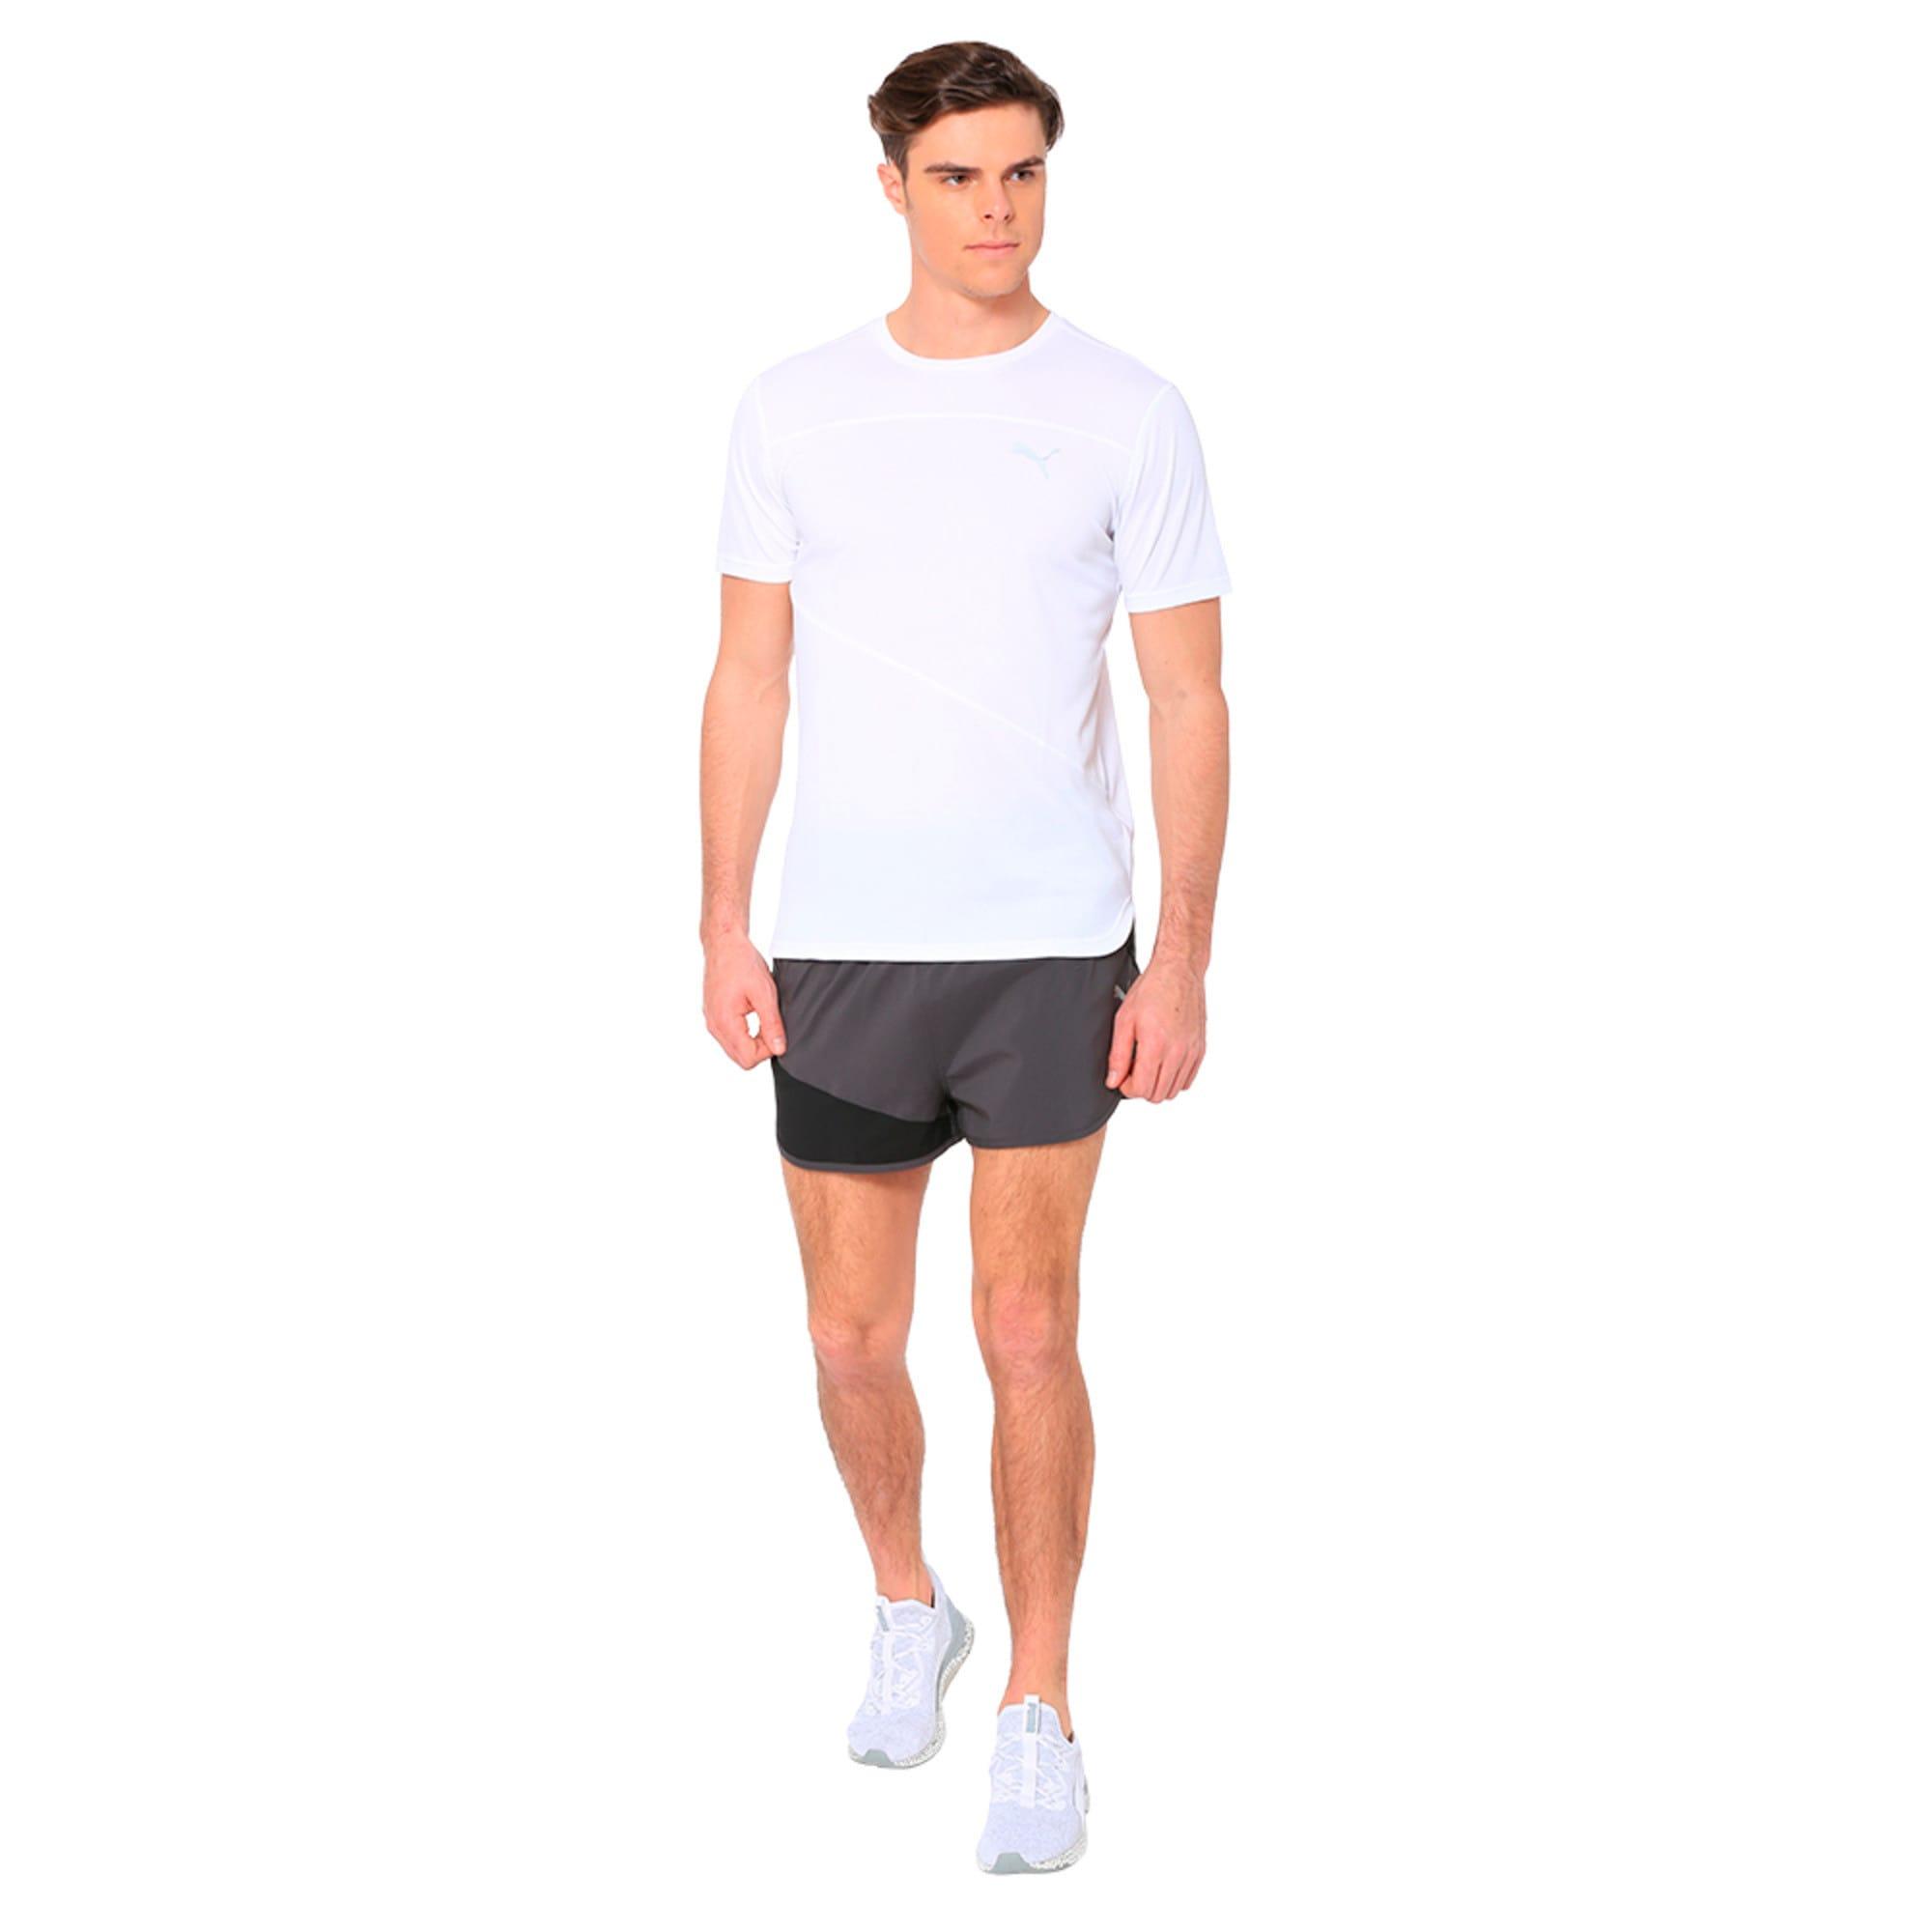 Thumbnail 3 of IGNITE Men's Running Split Shorts, Puma Black-Asphalt, medium-IND